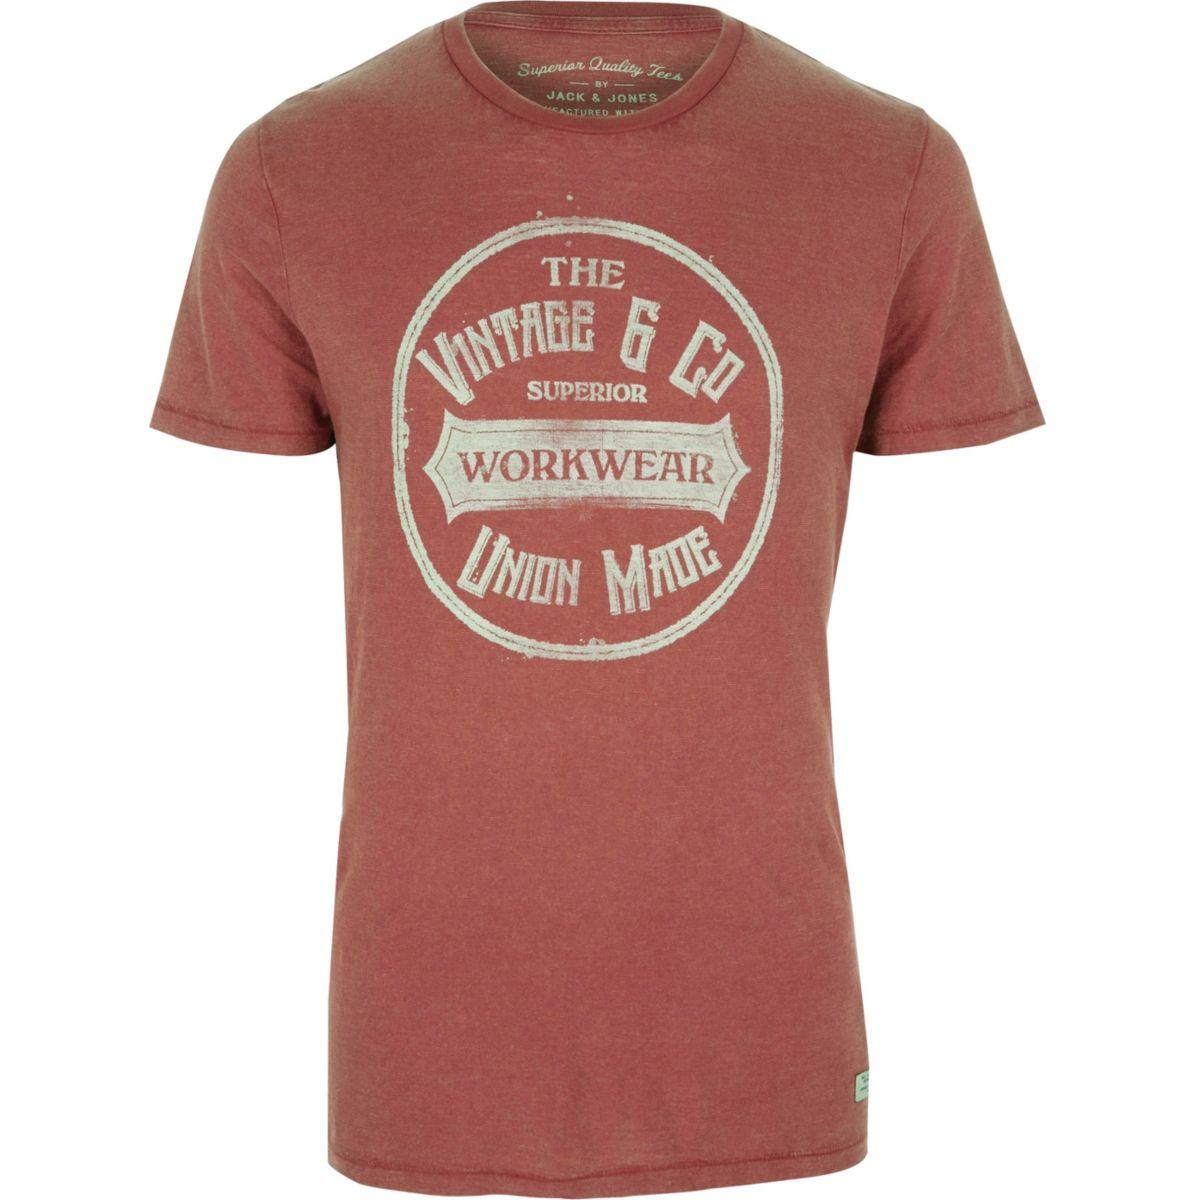 Red Jack & Jones printed T-shirt